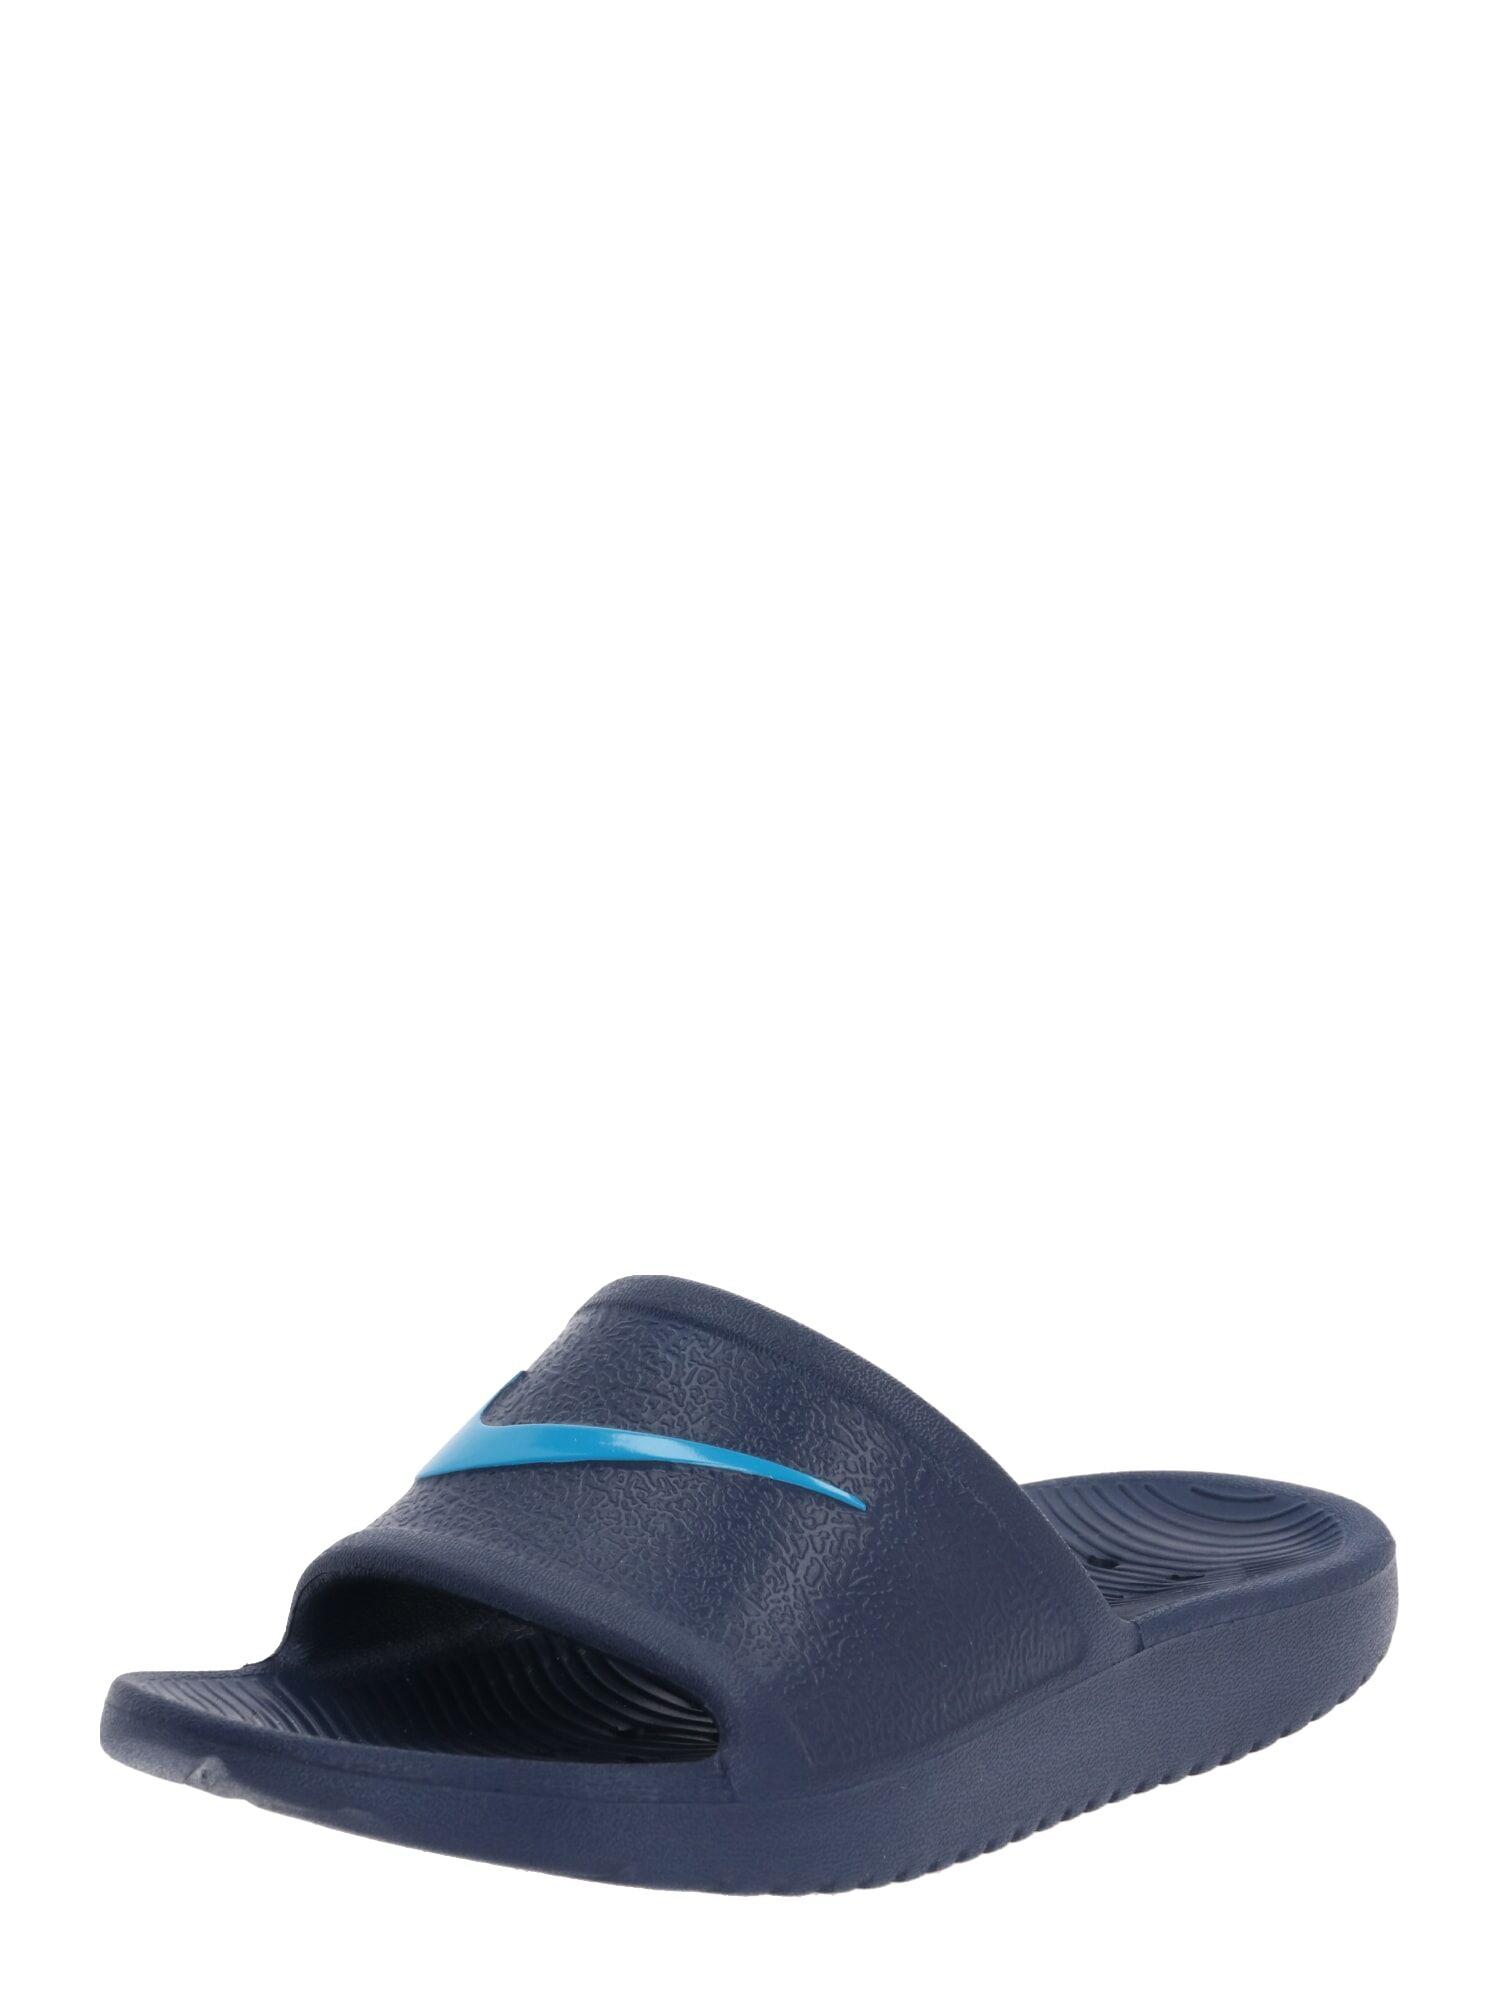 Nike Sportswear Claquettes / Tongs 'KAWA'  - Bleu - Taille: 6Y - boy